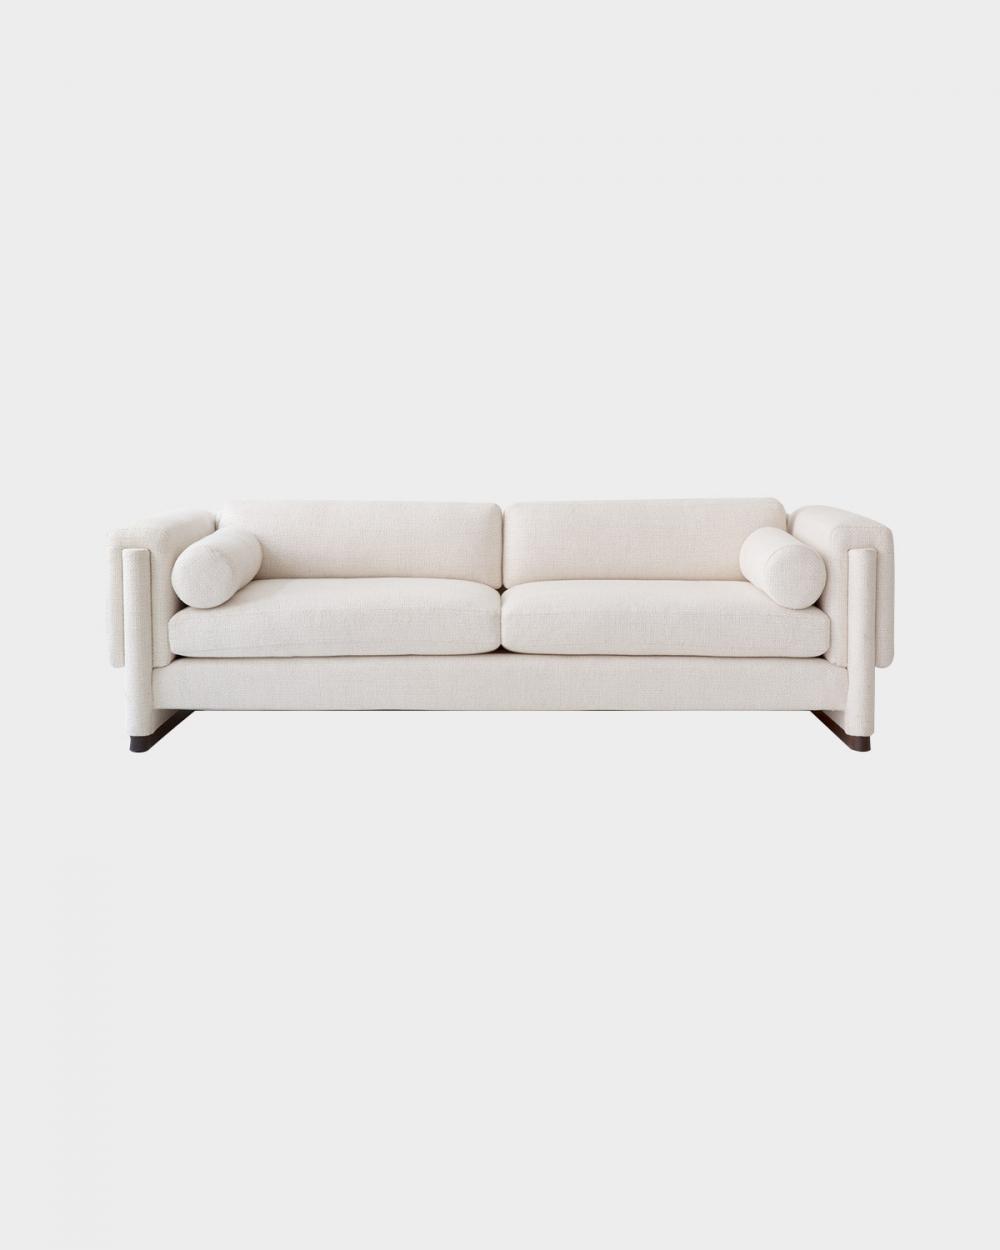 curved furniture trend